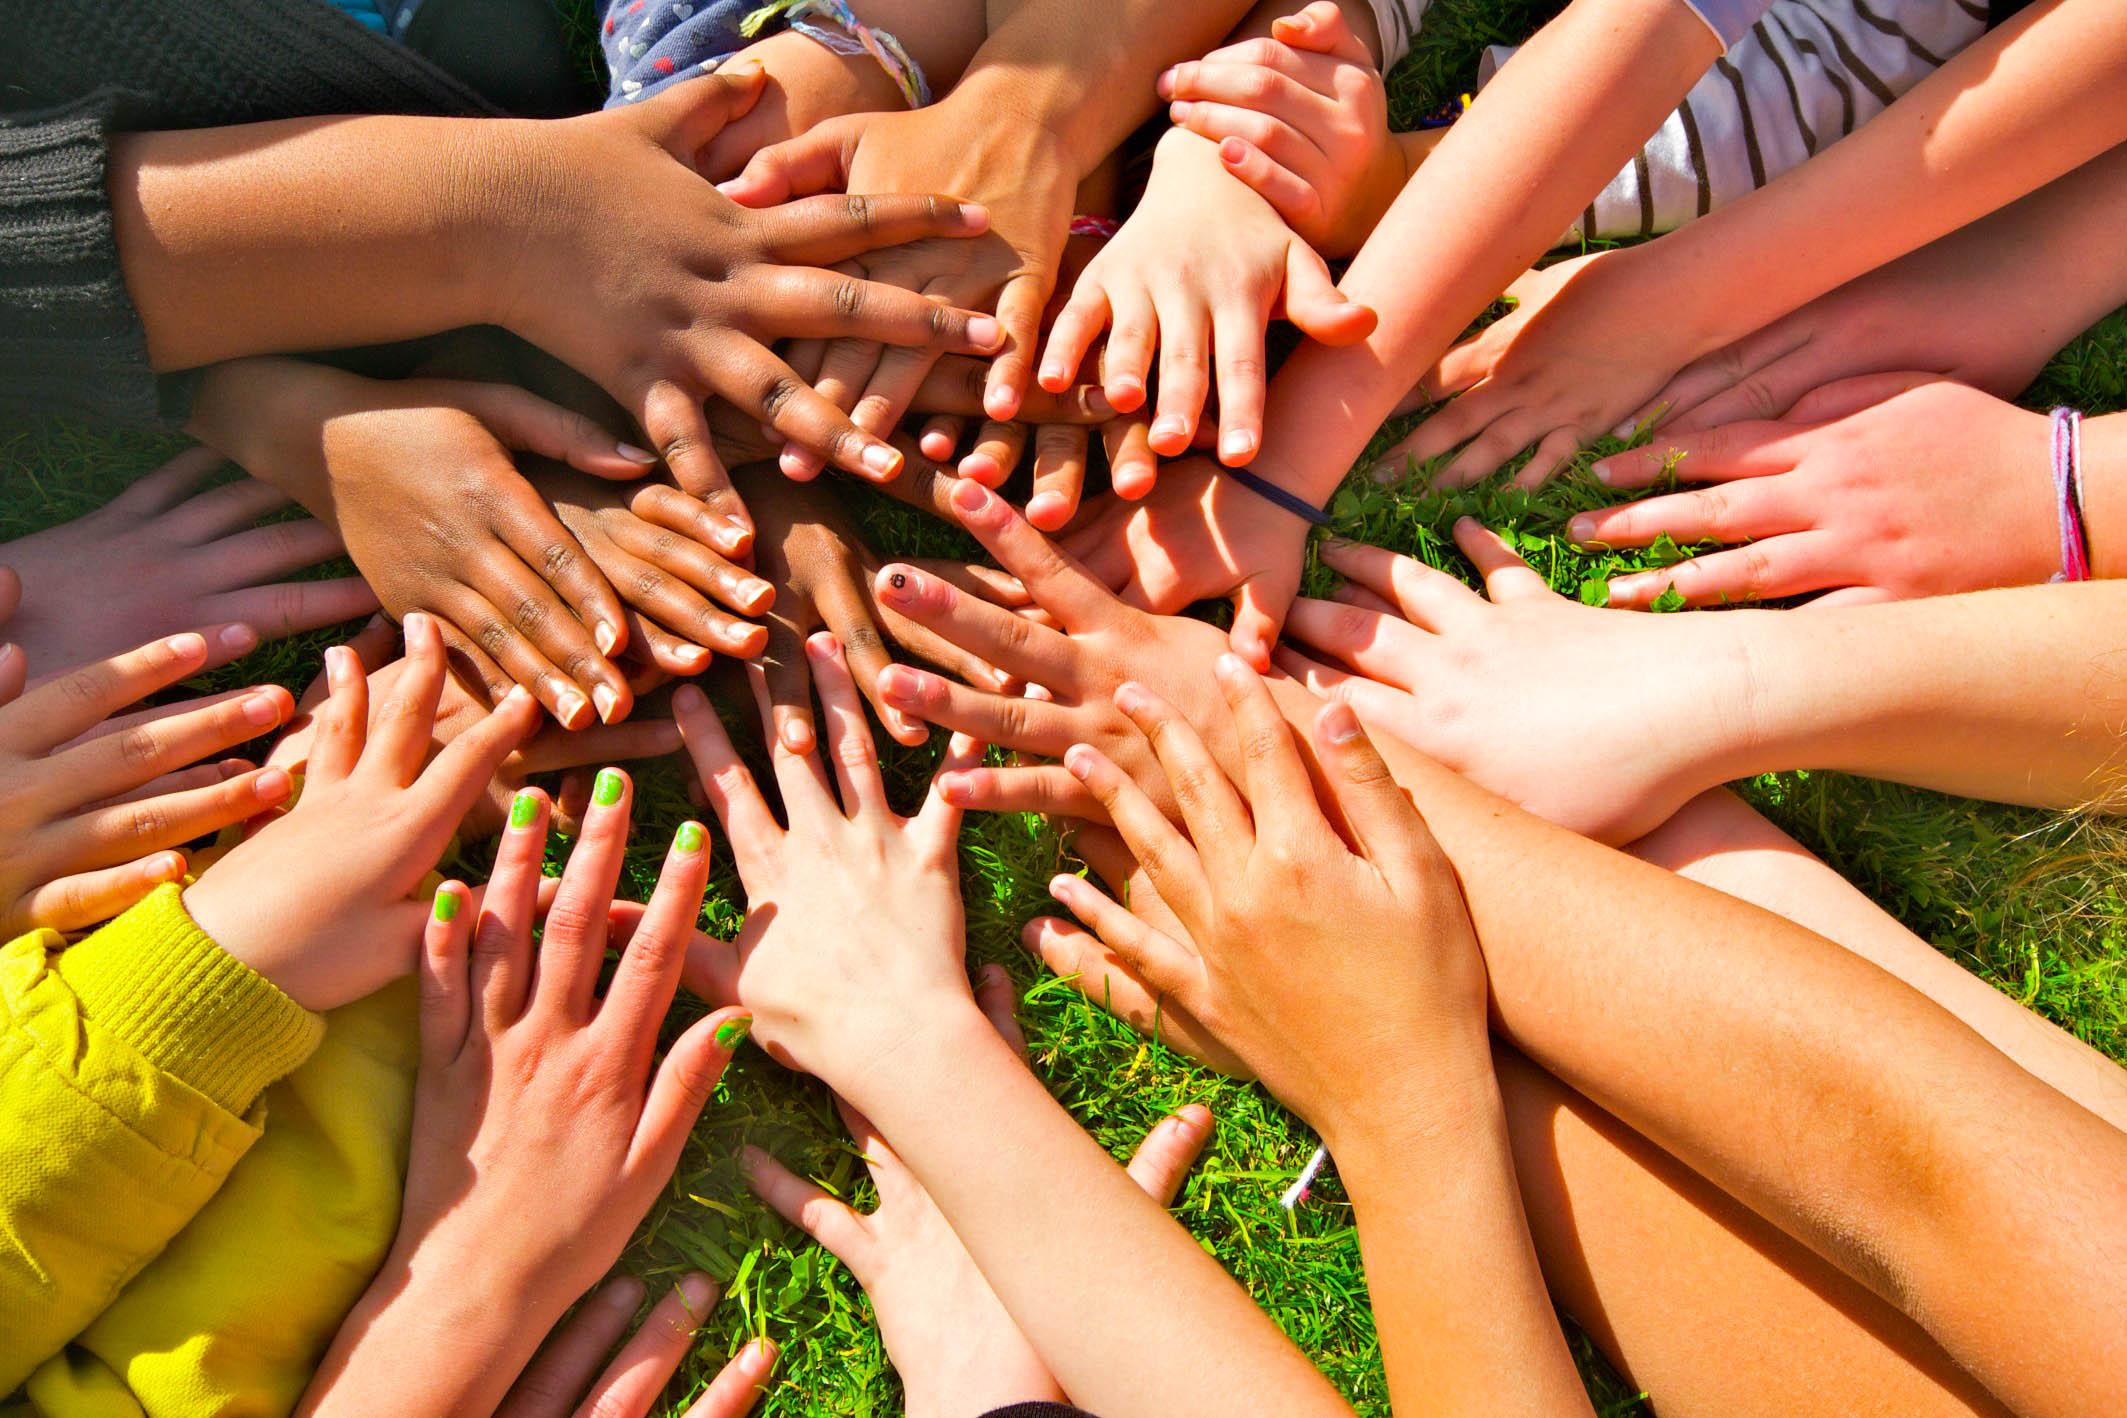 Racial-Harmony-Hand-in-Hand